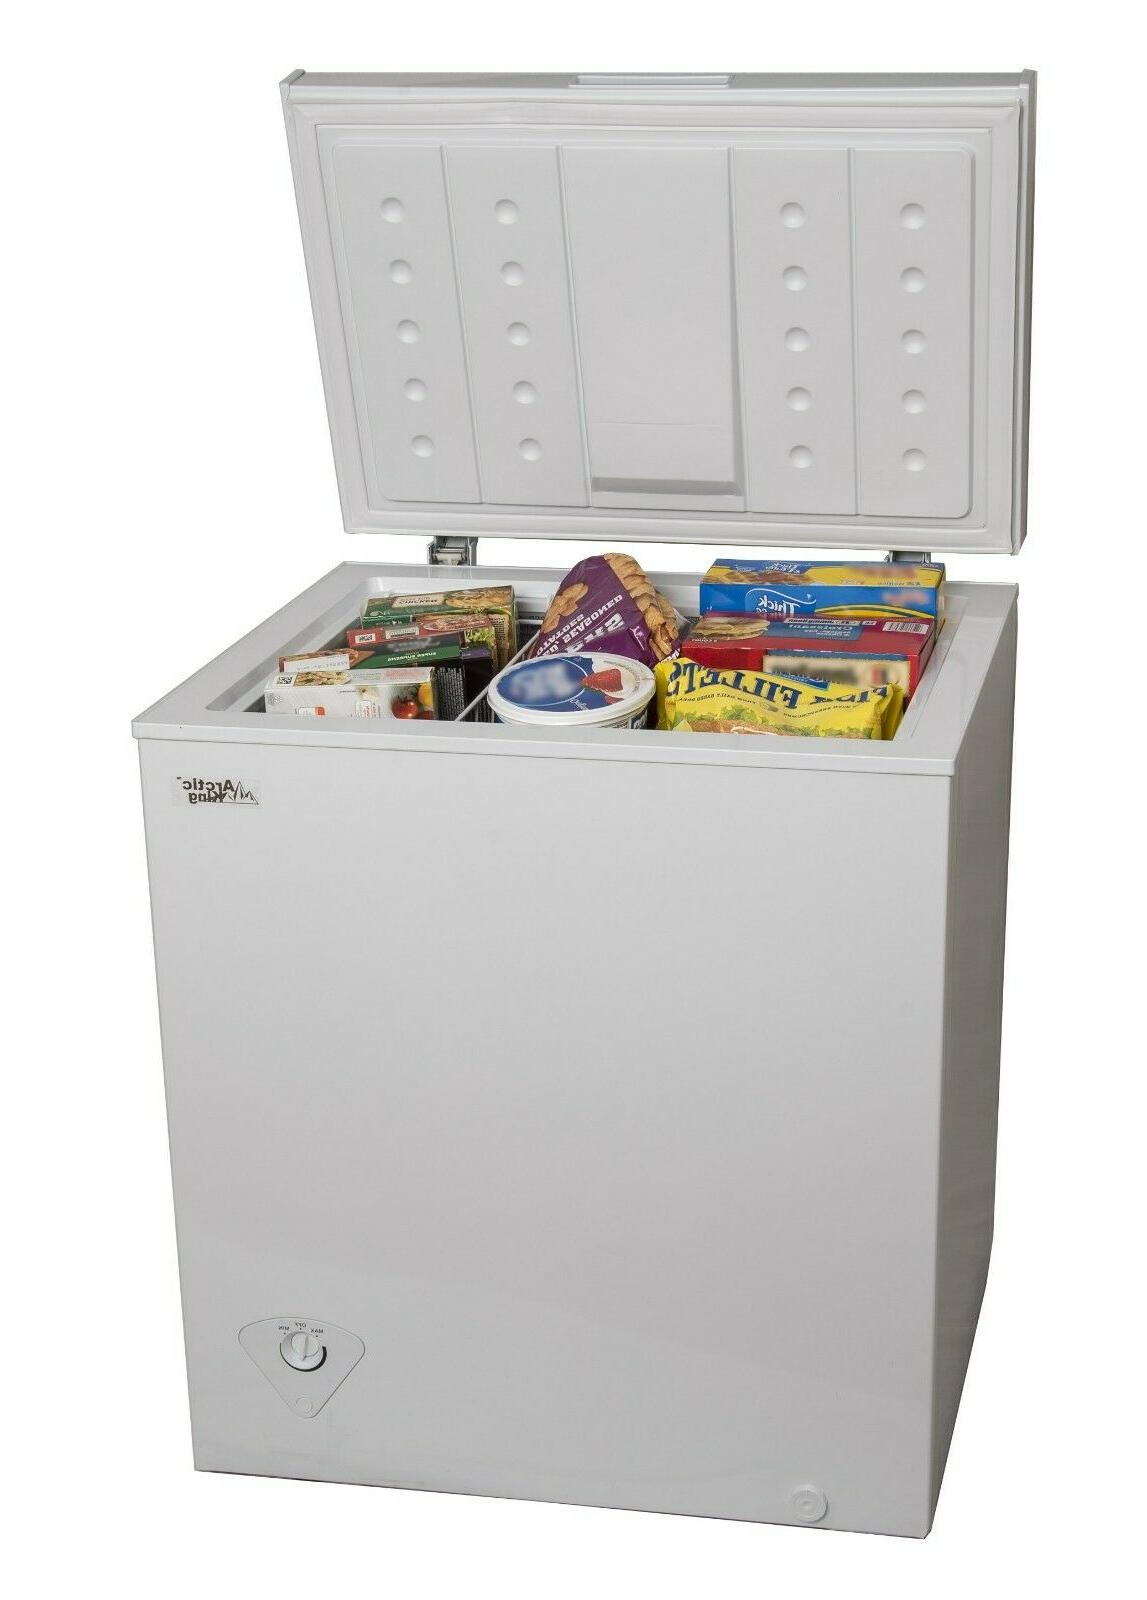 Capacity Chest Freezer Haier HF50CM23NW 5.0 cu White ft